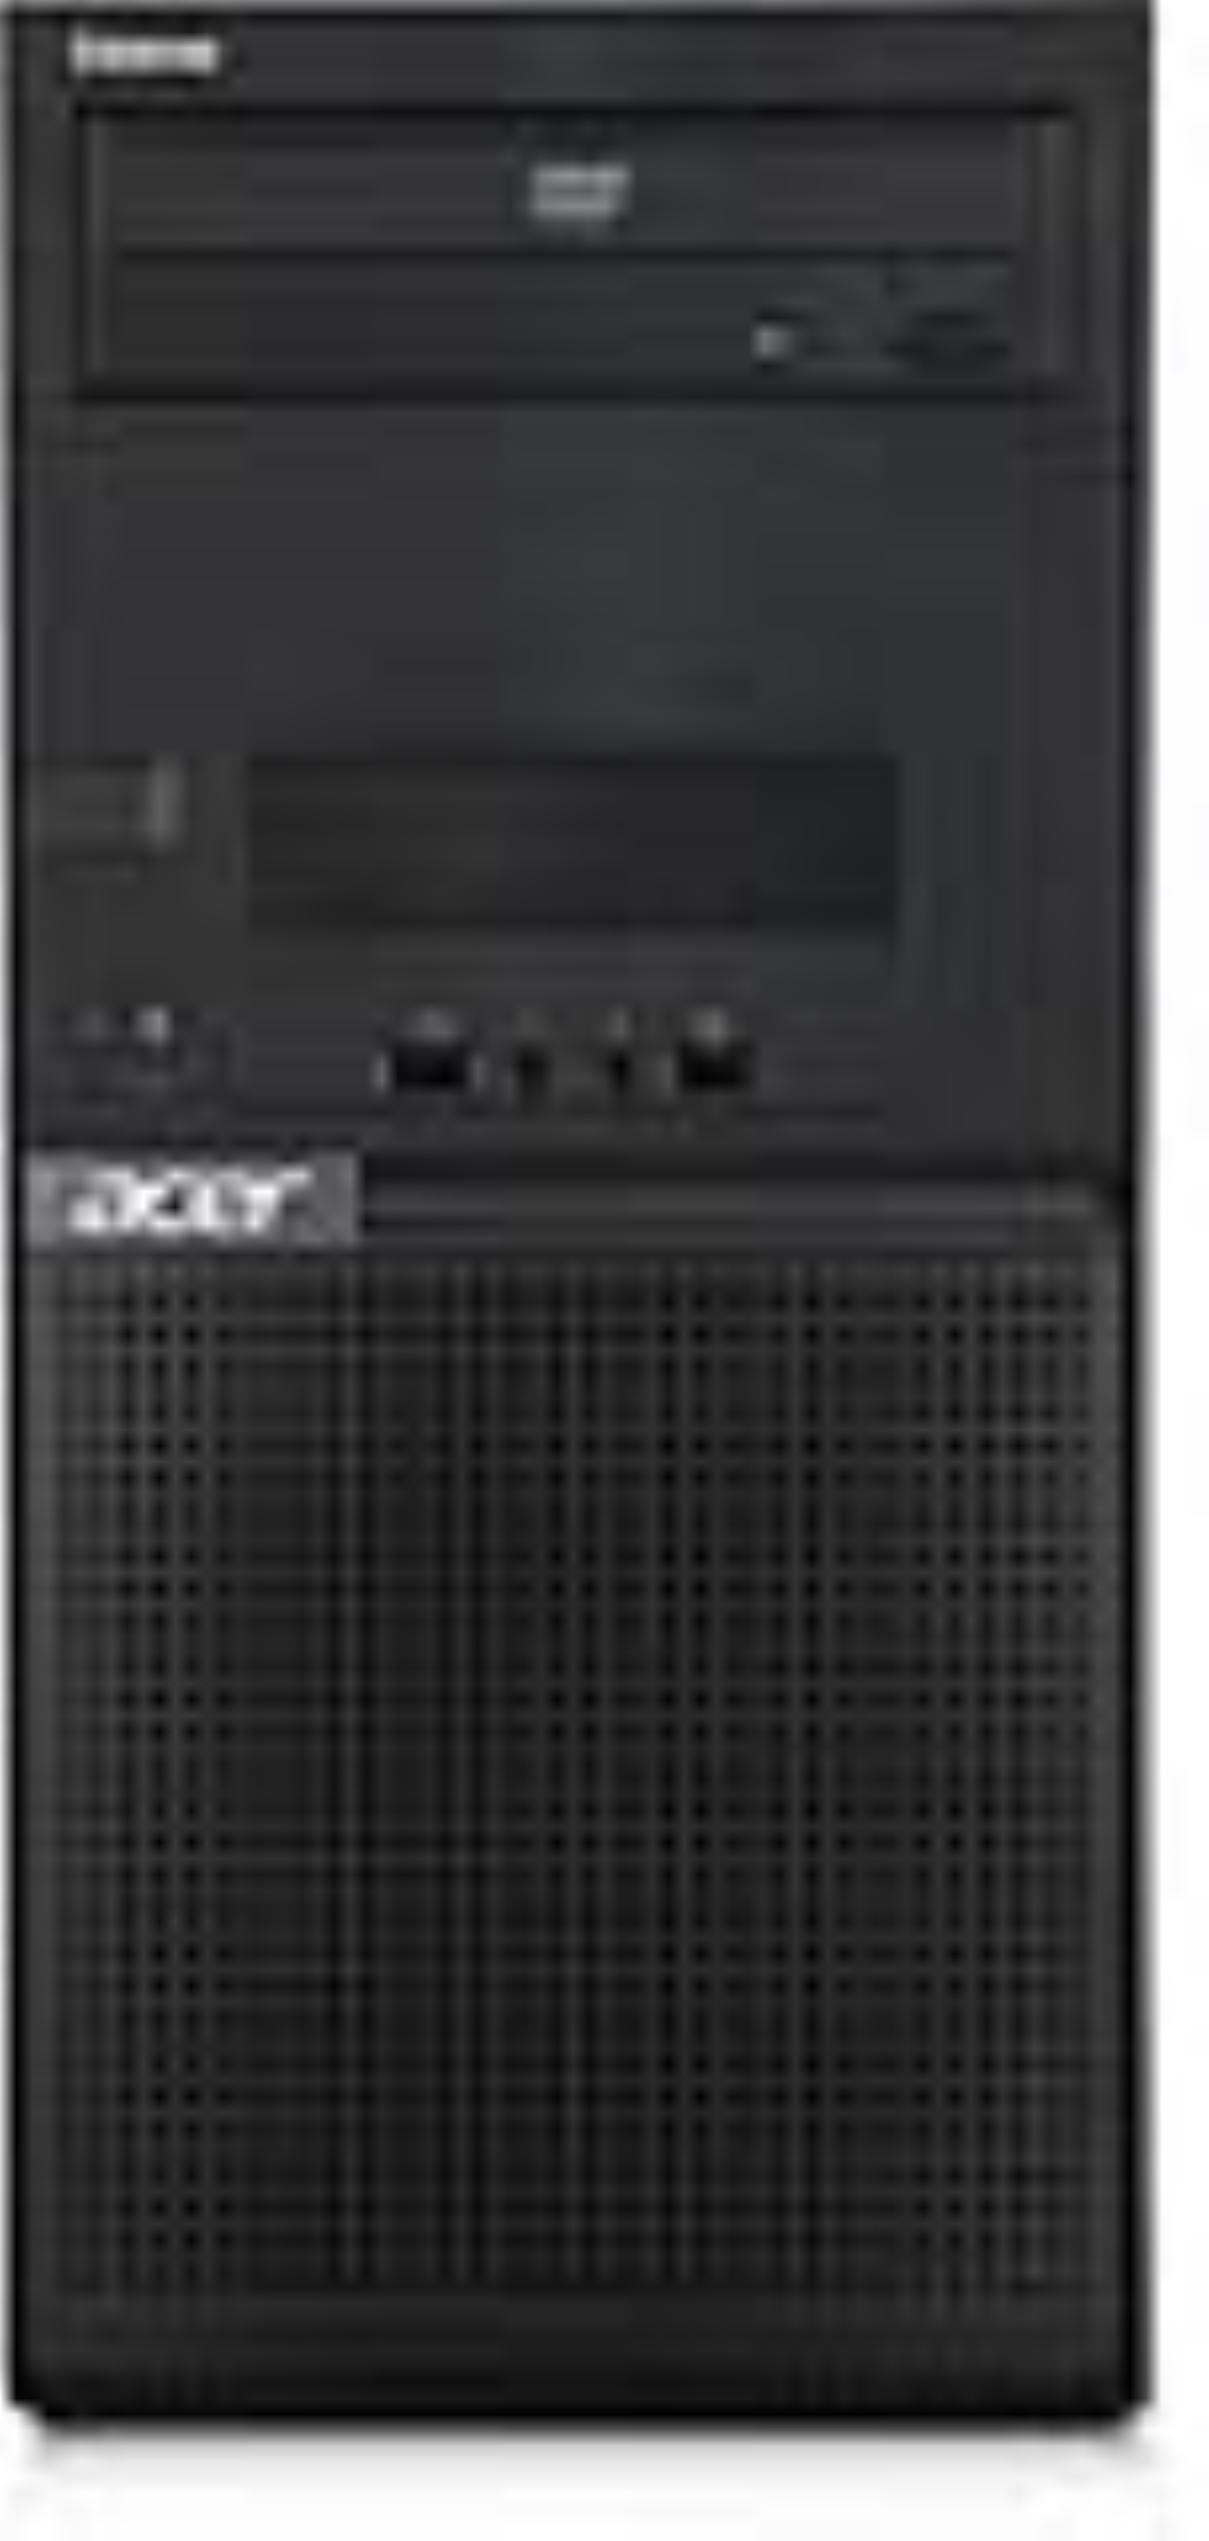 Acer Extensa M2710 Ci3-6100/4GB/128 GB SSD/DVDRW/klávesnice+myš/W10Pro s možností DG na Win7Pro